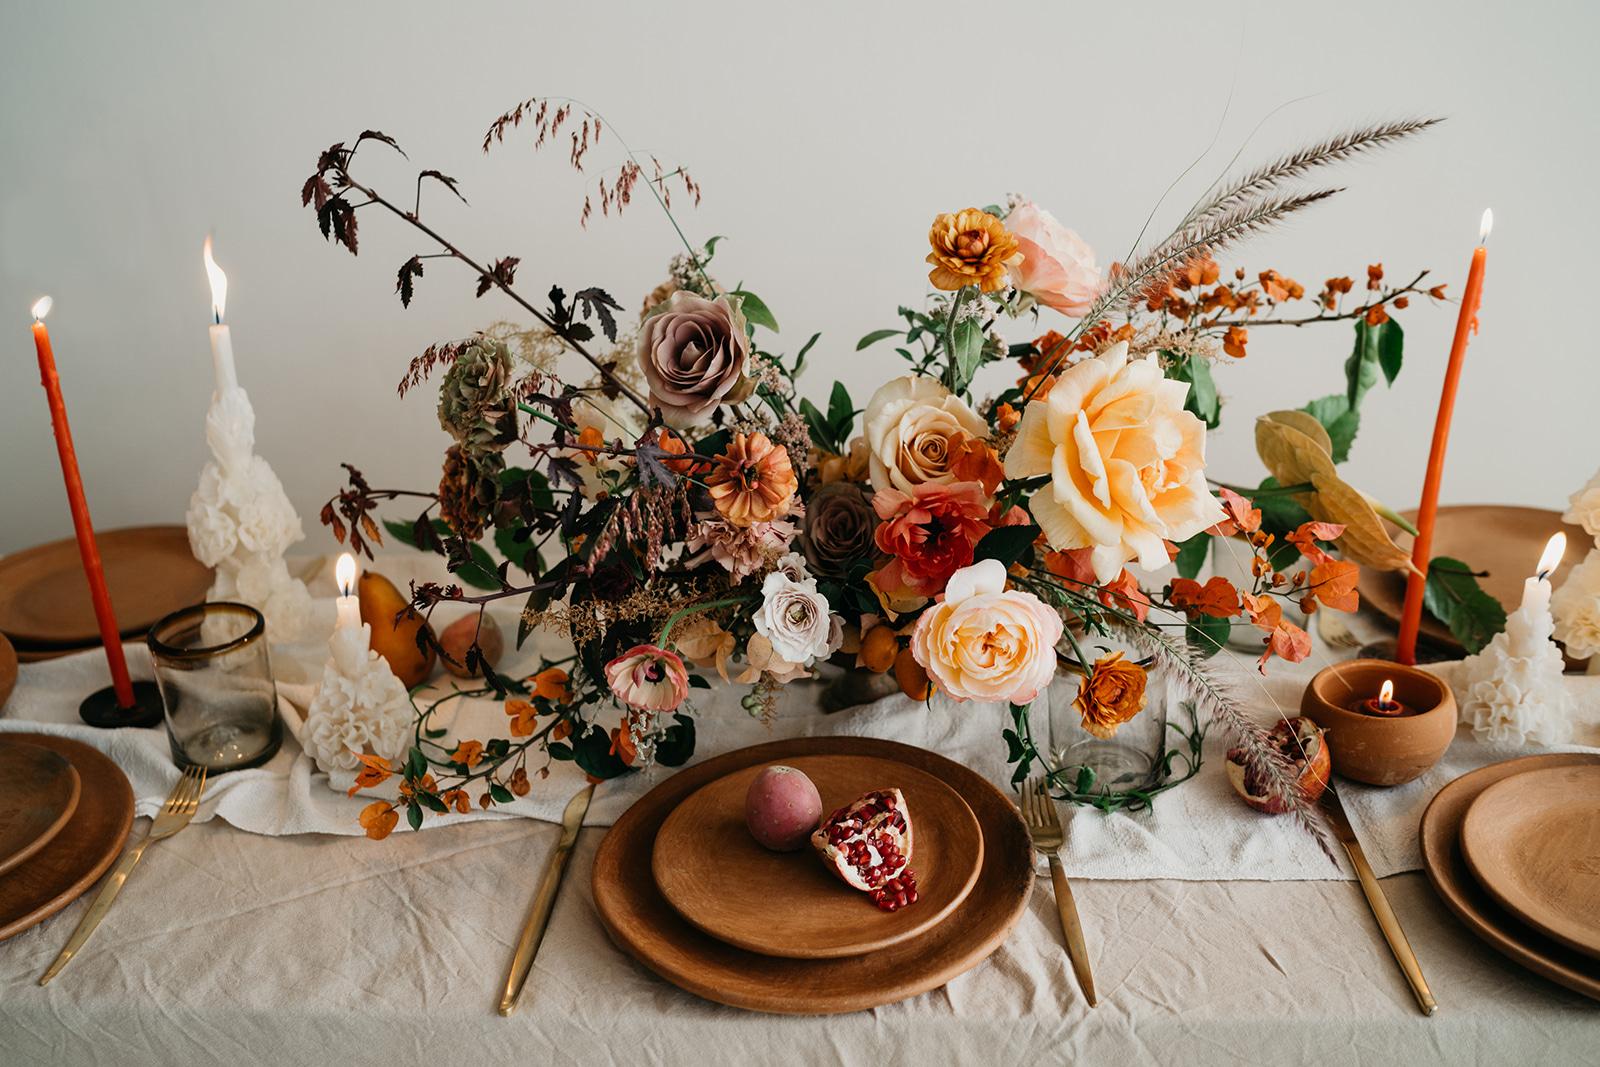 Foto:  The Times We Have . Diseño Floral:  Floweriize  y  Hunt & Gather Floral .